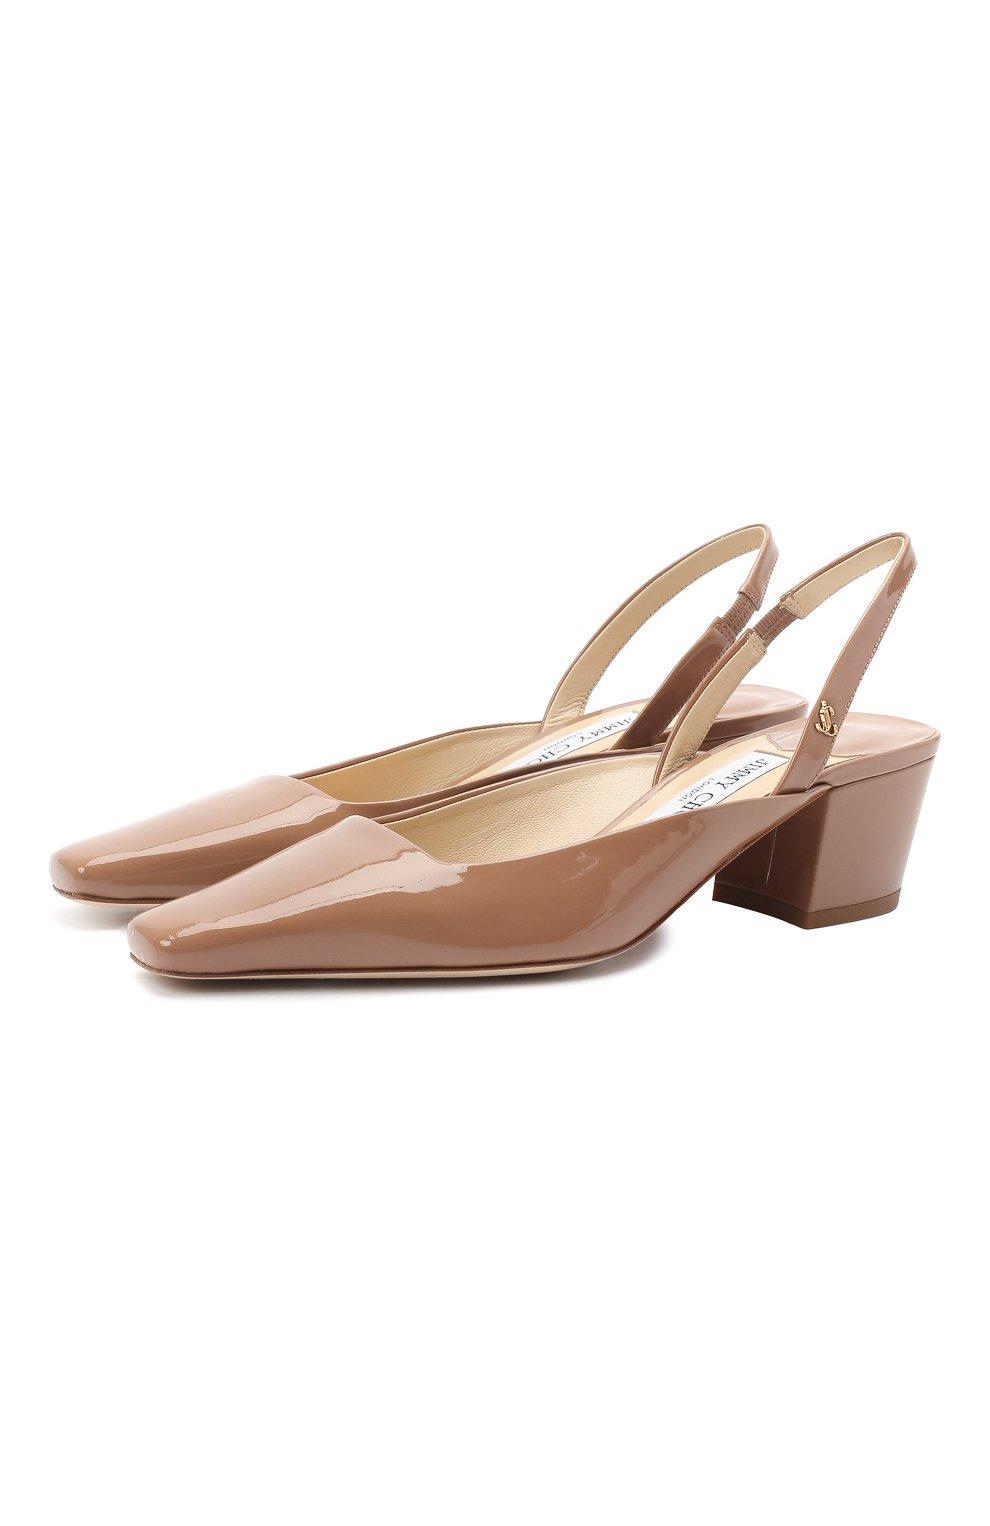 Женские кожаные туфли gini 45 JIMMY CHOO темно-бежевого цвета, арт. GINI 45/GHE | Фото 1